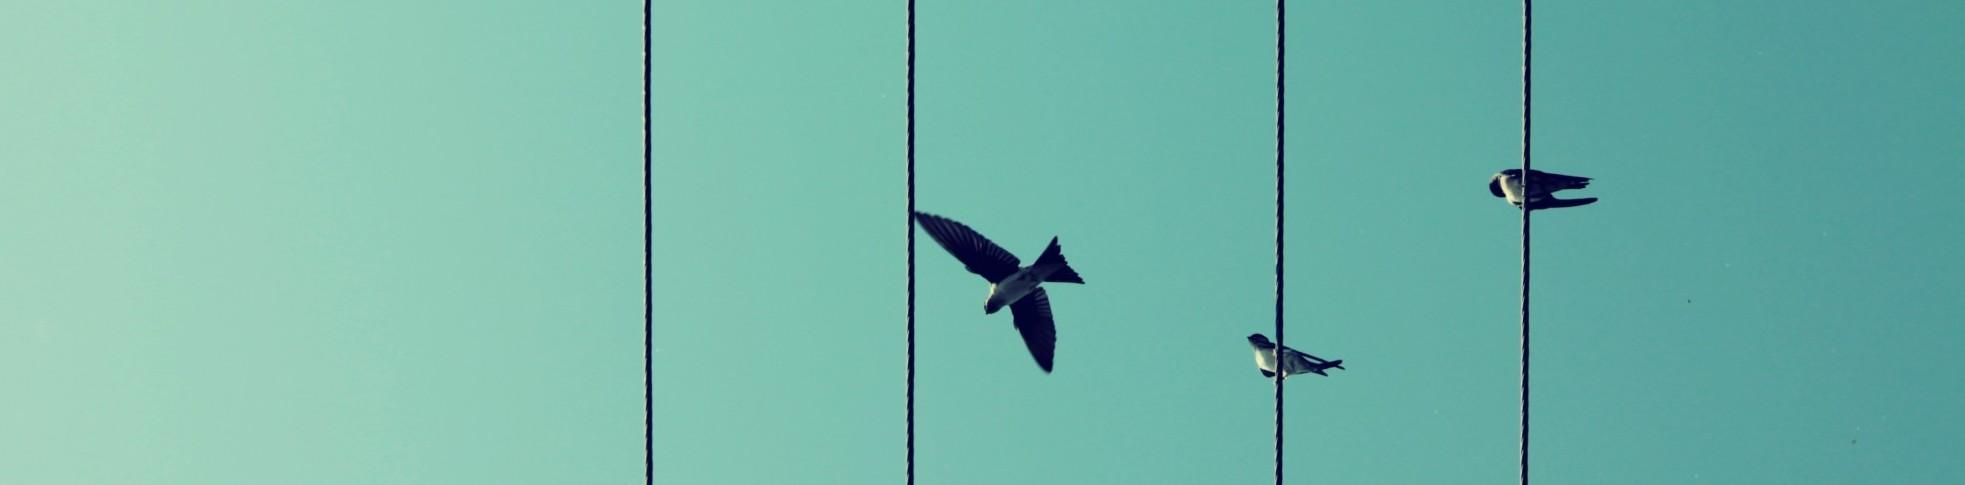 birds-209280